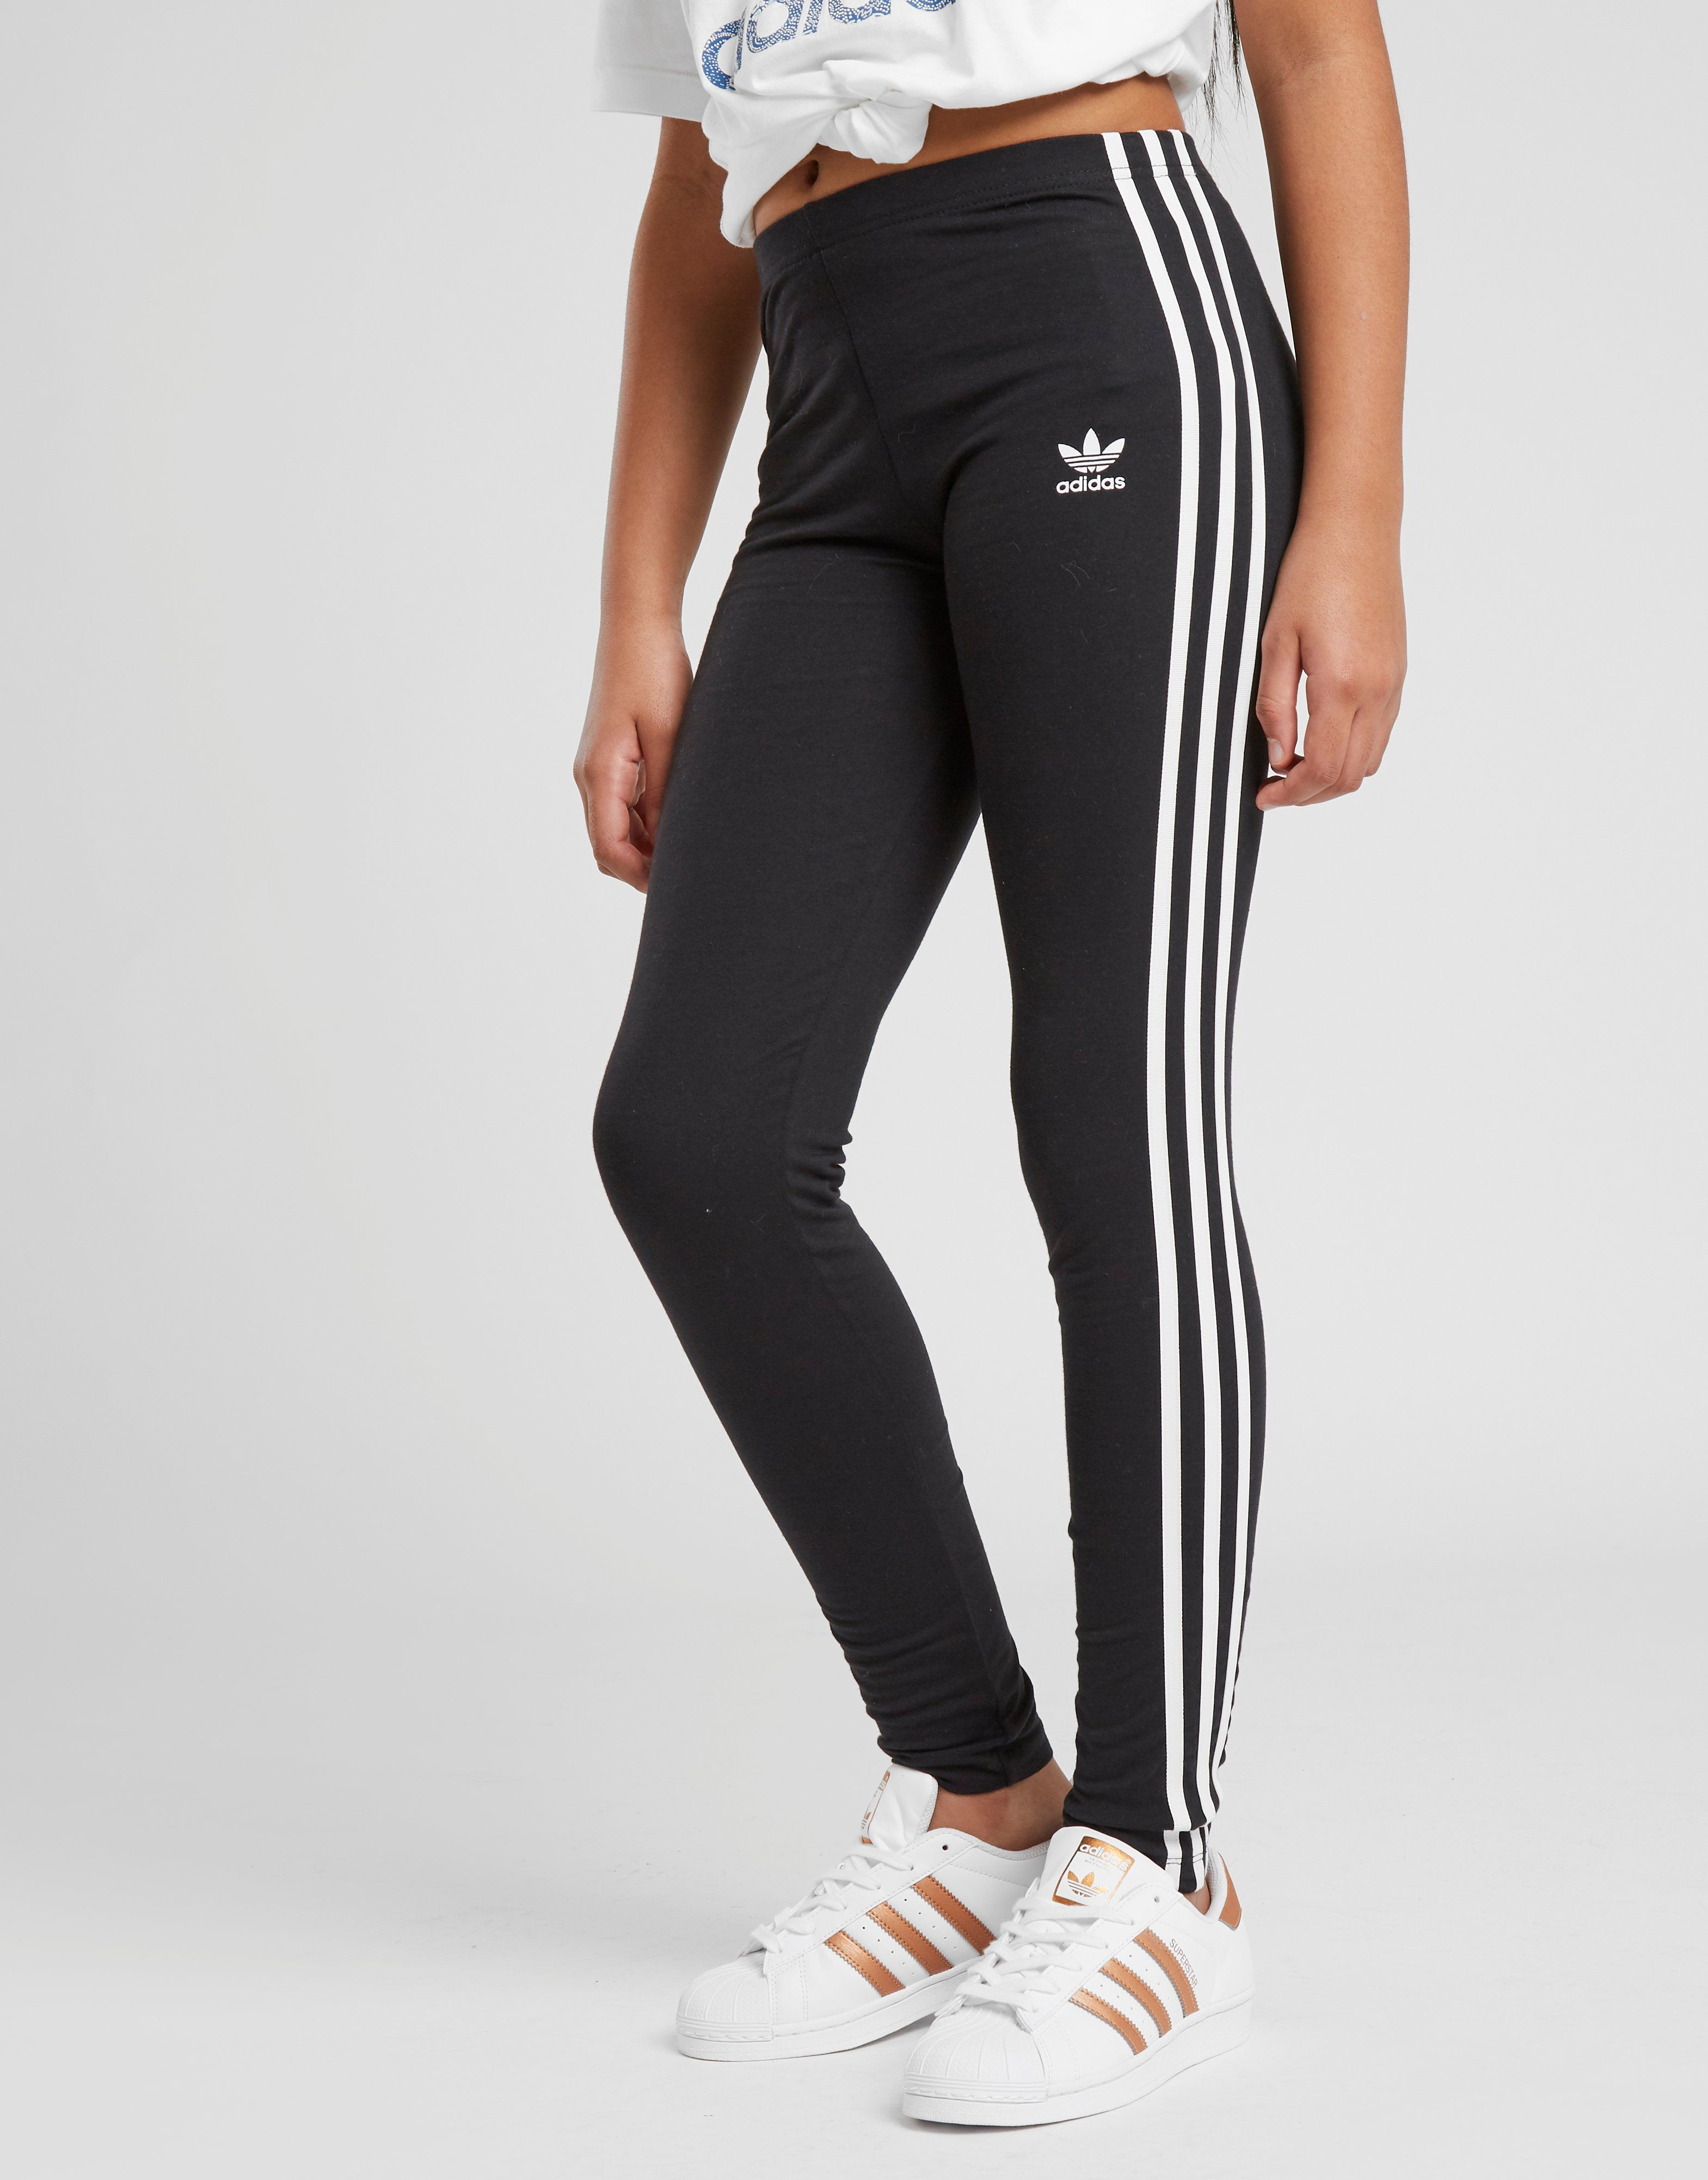 3aa21cc6748 adidas Originals Girls' Trefoil 3-Stripes Leggings Junior | JD Sports